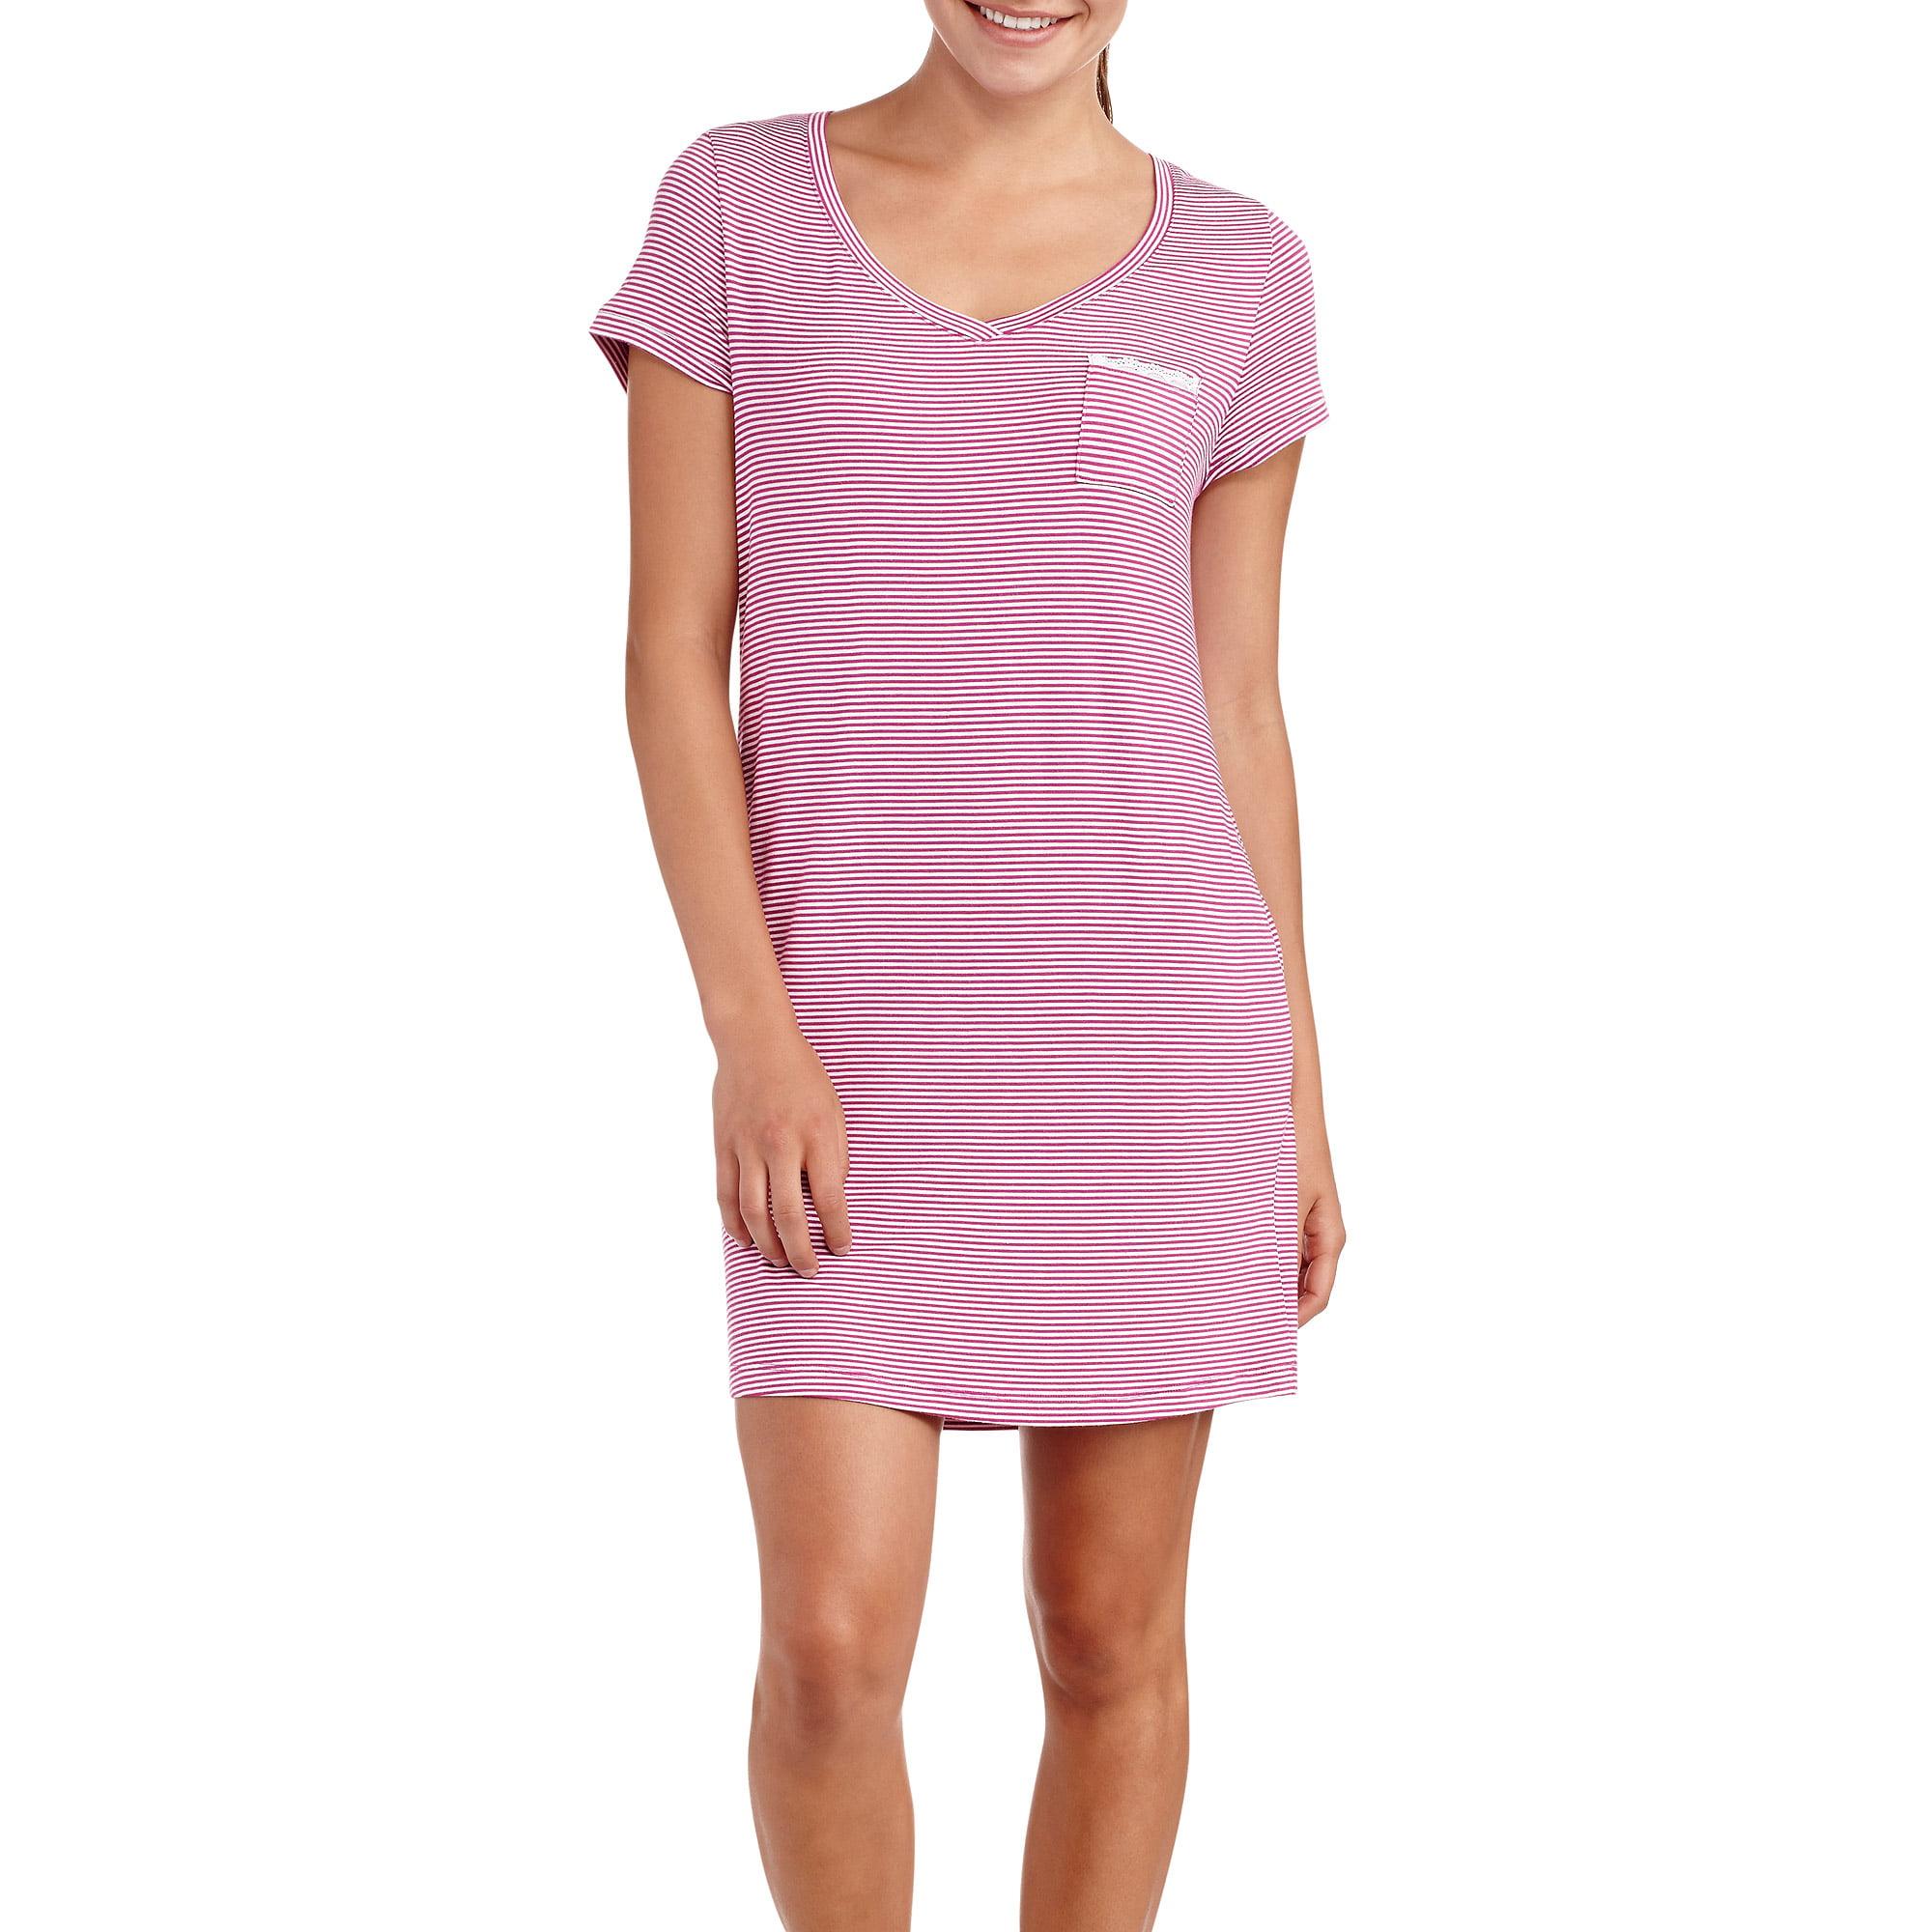 Faded Glory Women's Short Sleeve V-Neck Sleep Shirt with Pocket